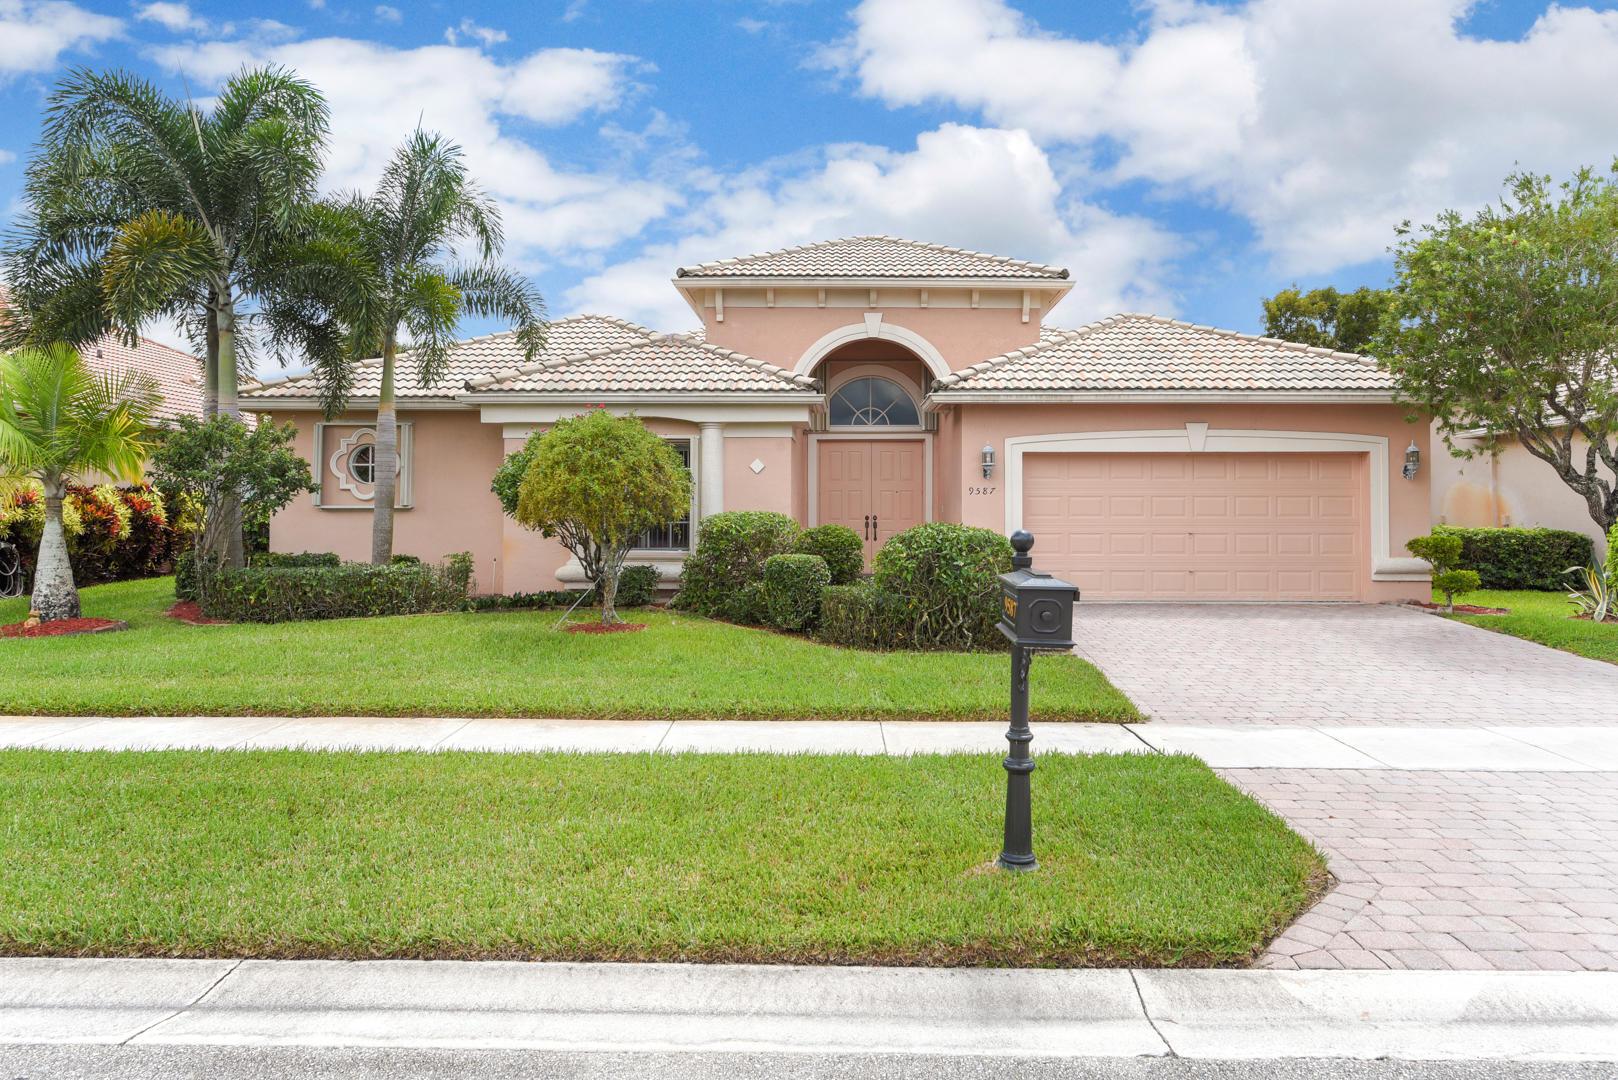 9587 San Vittore Street, Lake Worth, Florida 33467, 4 Bedrooms Bedrooms, ,2.1 BathroomsBathrooms,Single Family,For Sale,Bellaggio,San Vittore,RX-10557827